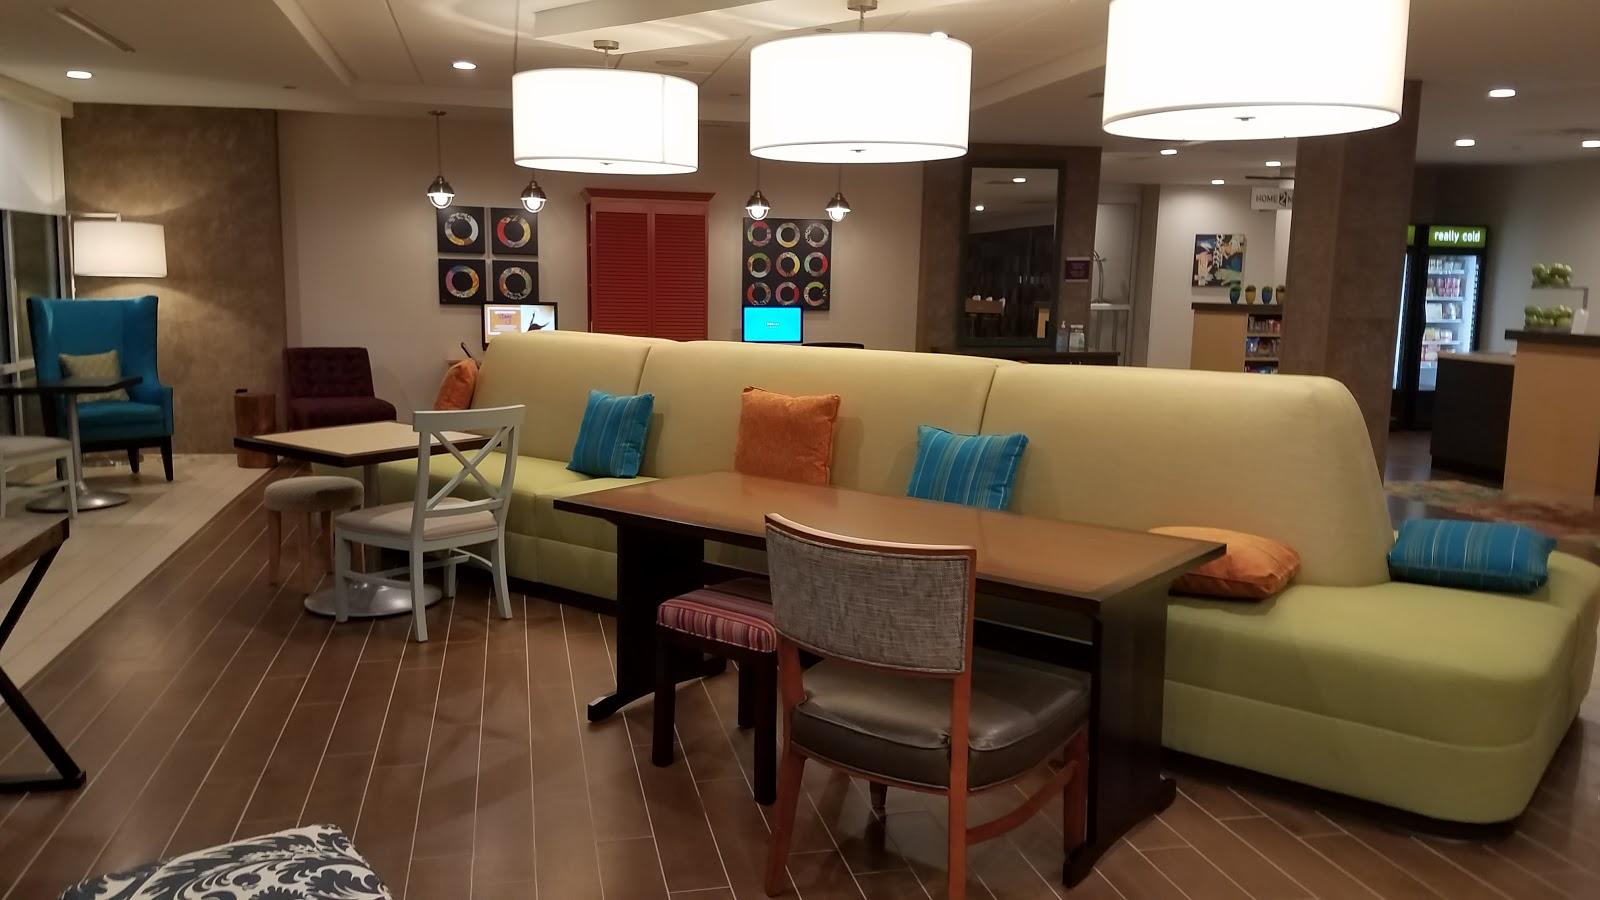 Executive Inn & Suites Map - Bowling Green, Kentucky - Mapcarta